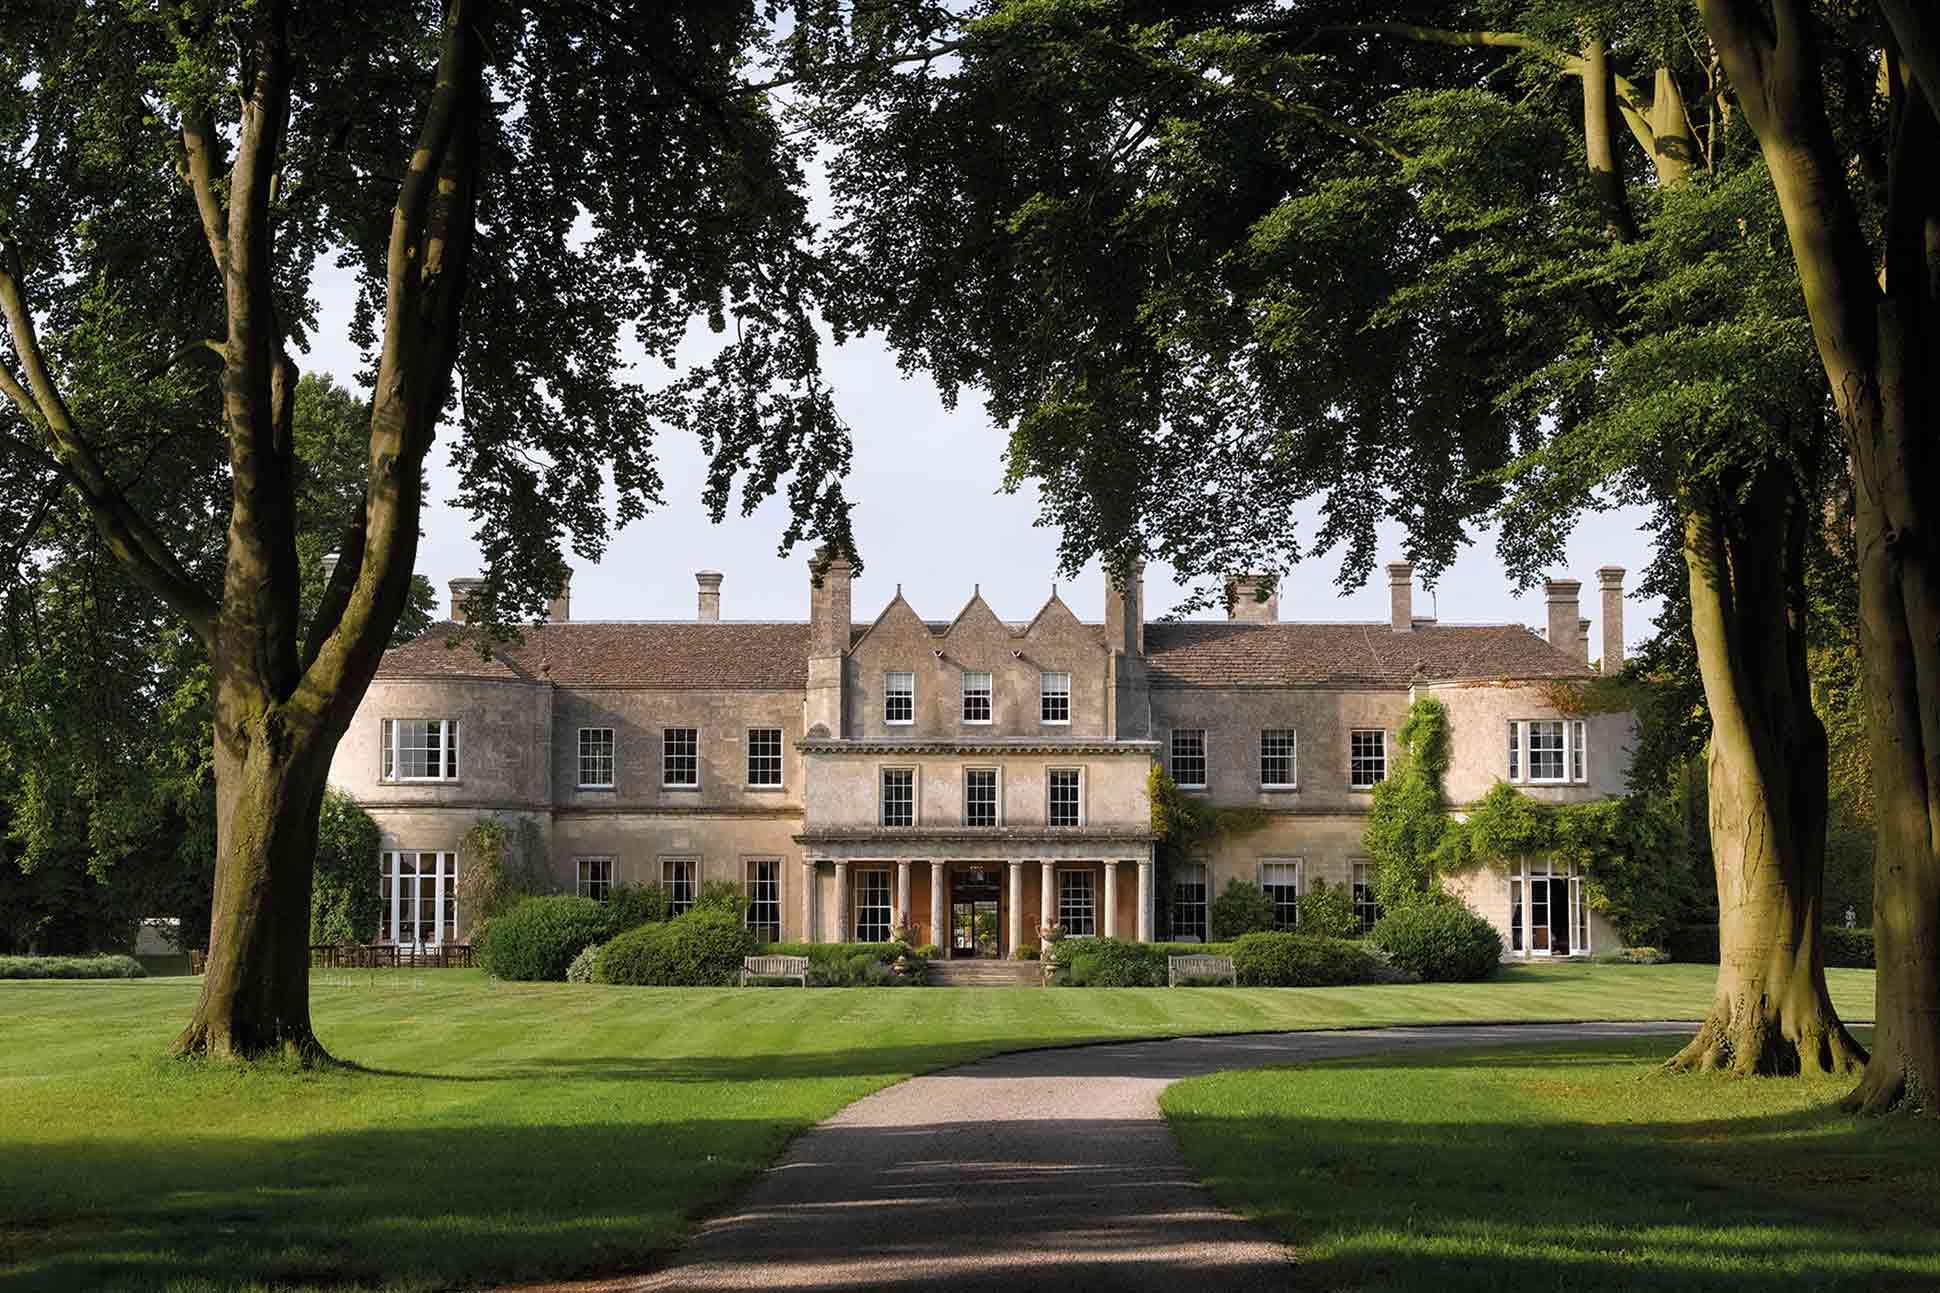 Lucknam Park <br> Wiltshire, United Kingdom